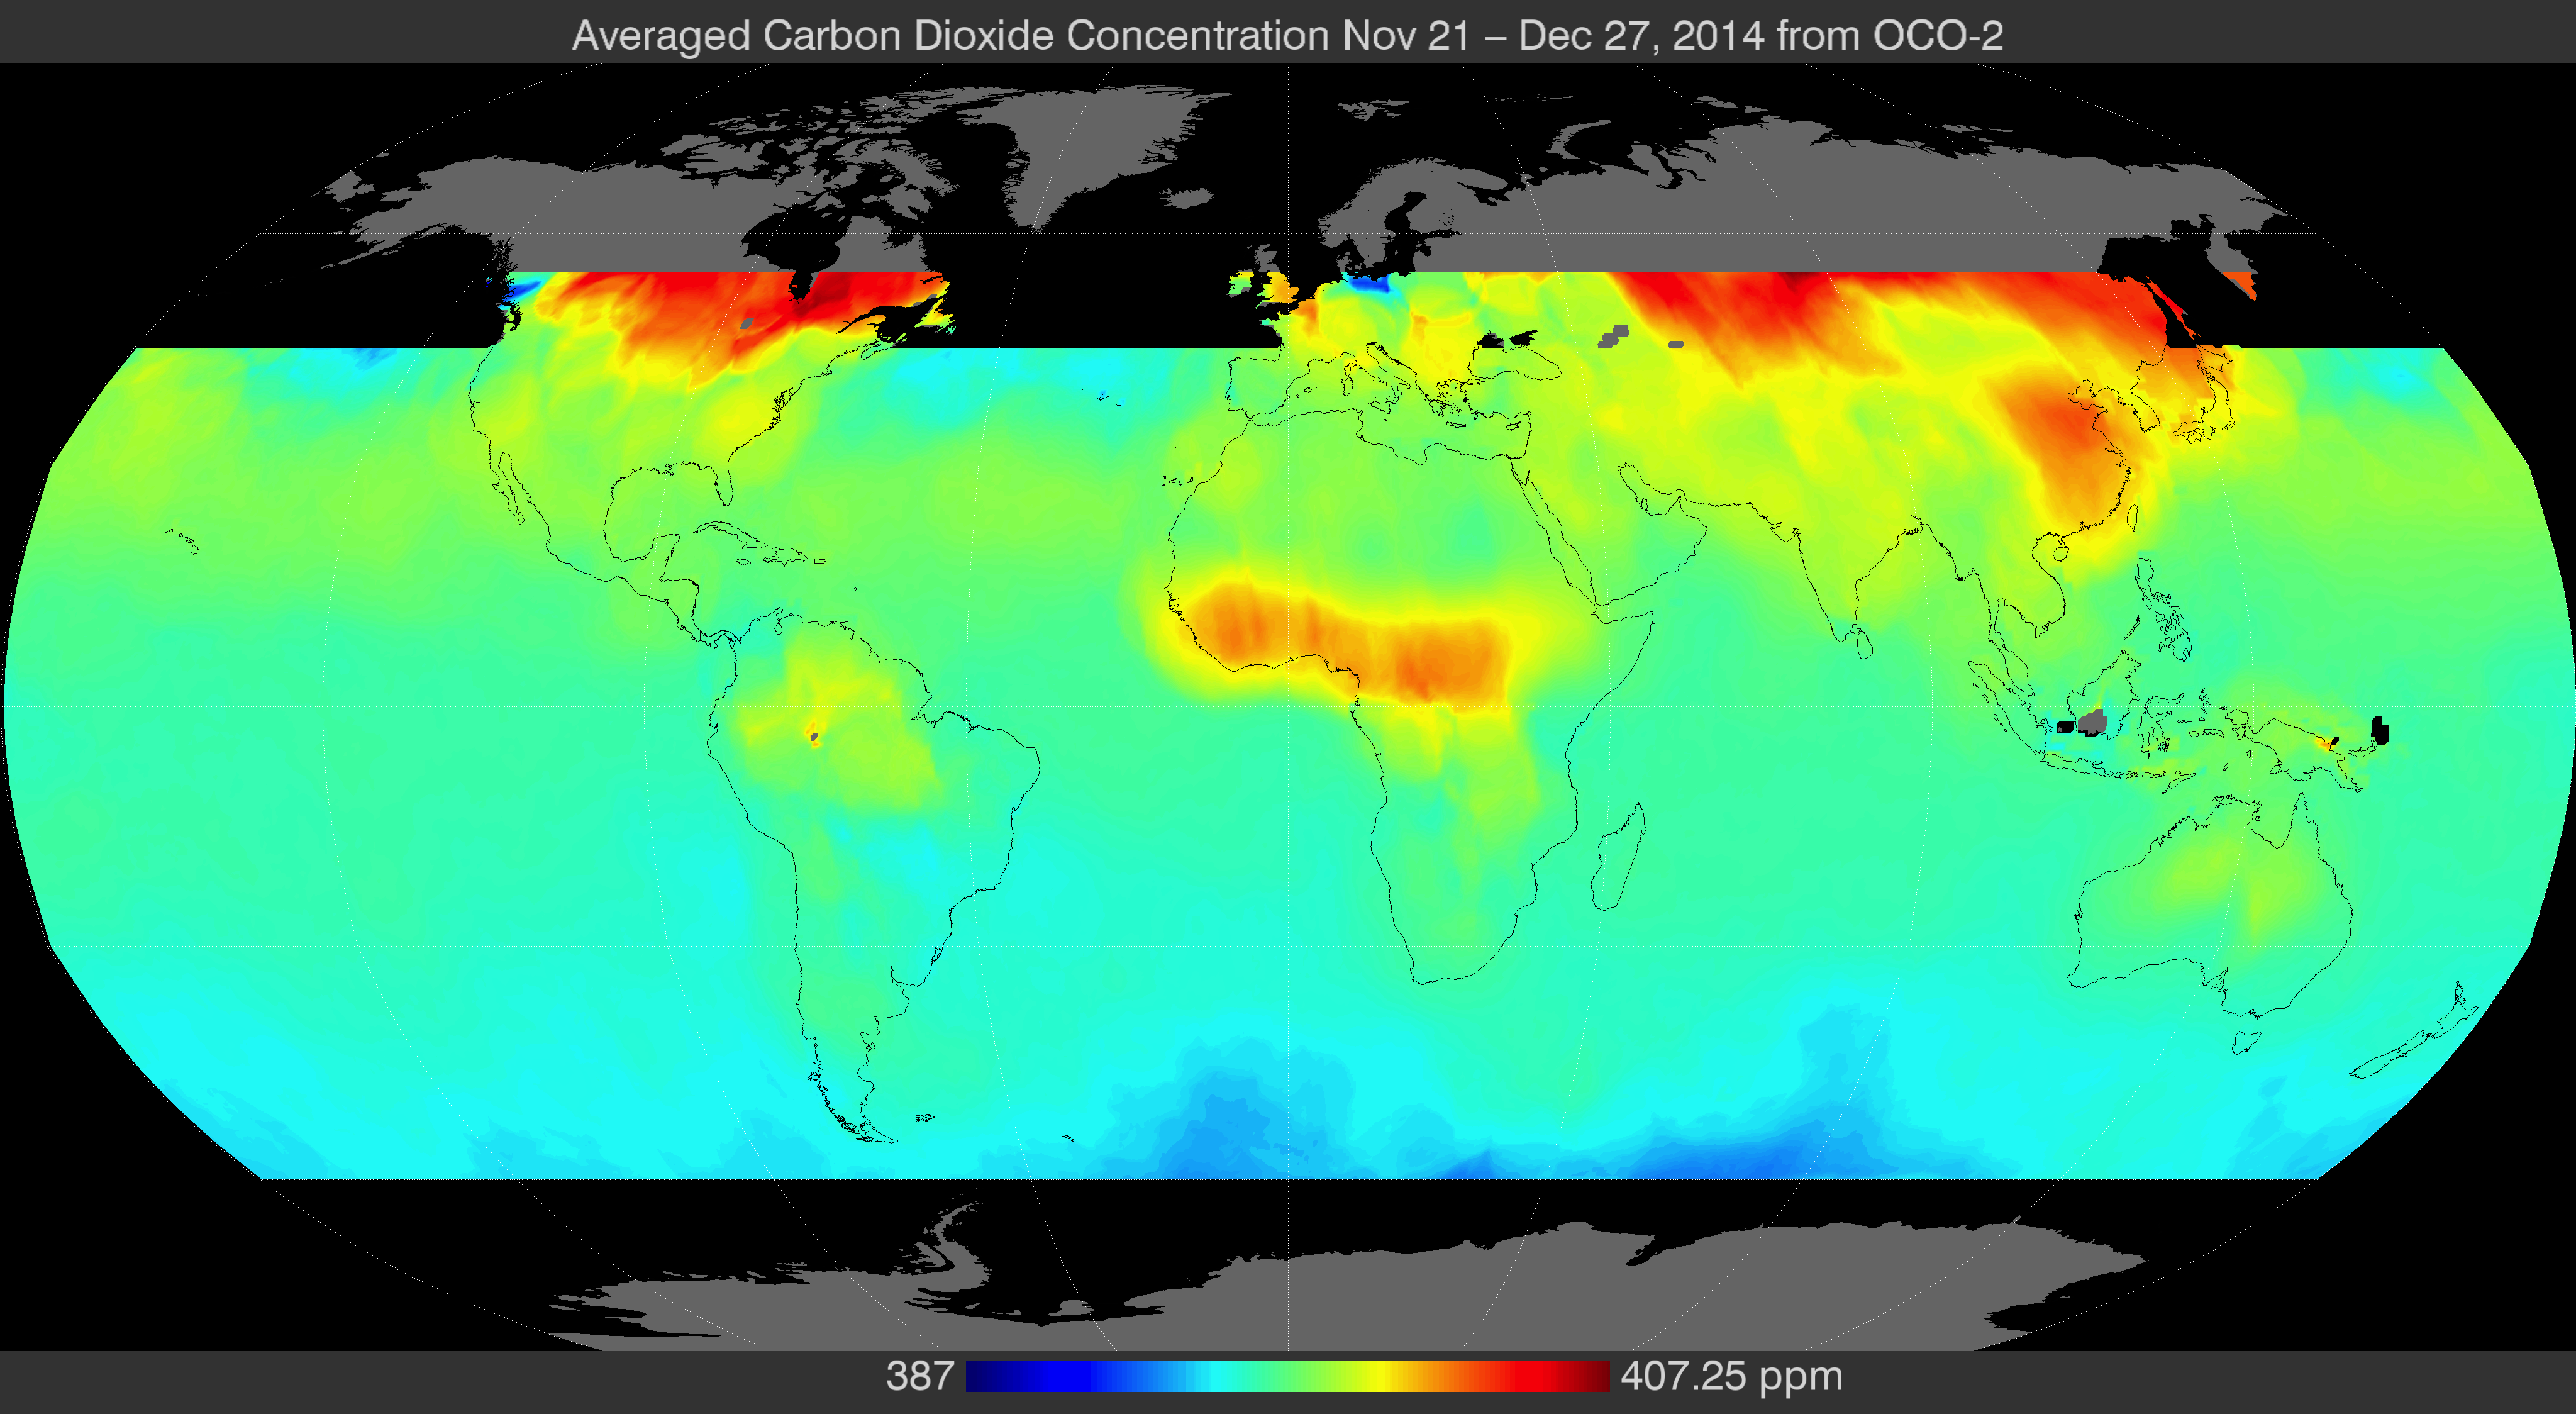 Finally: visualized OCO2 satellite data showing global